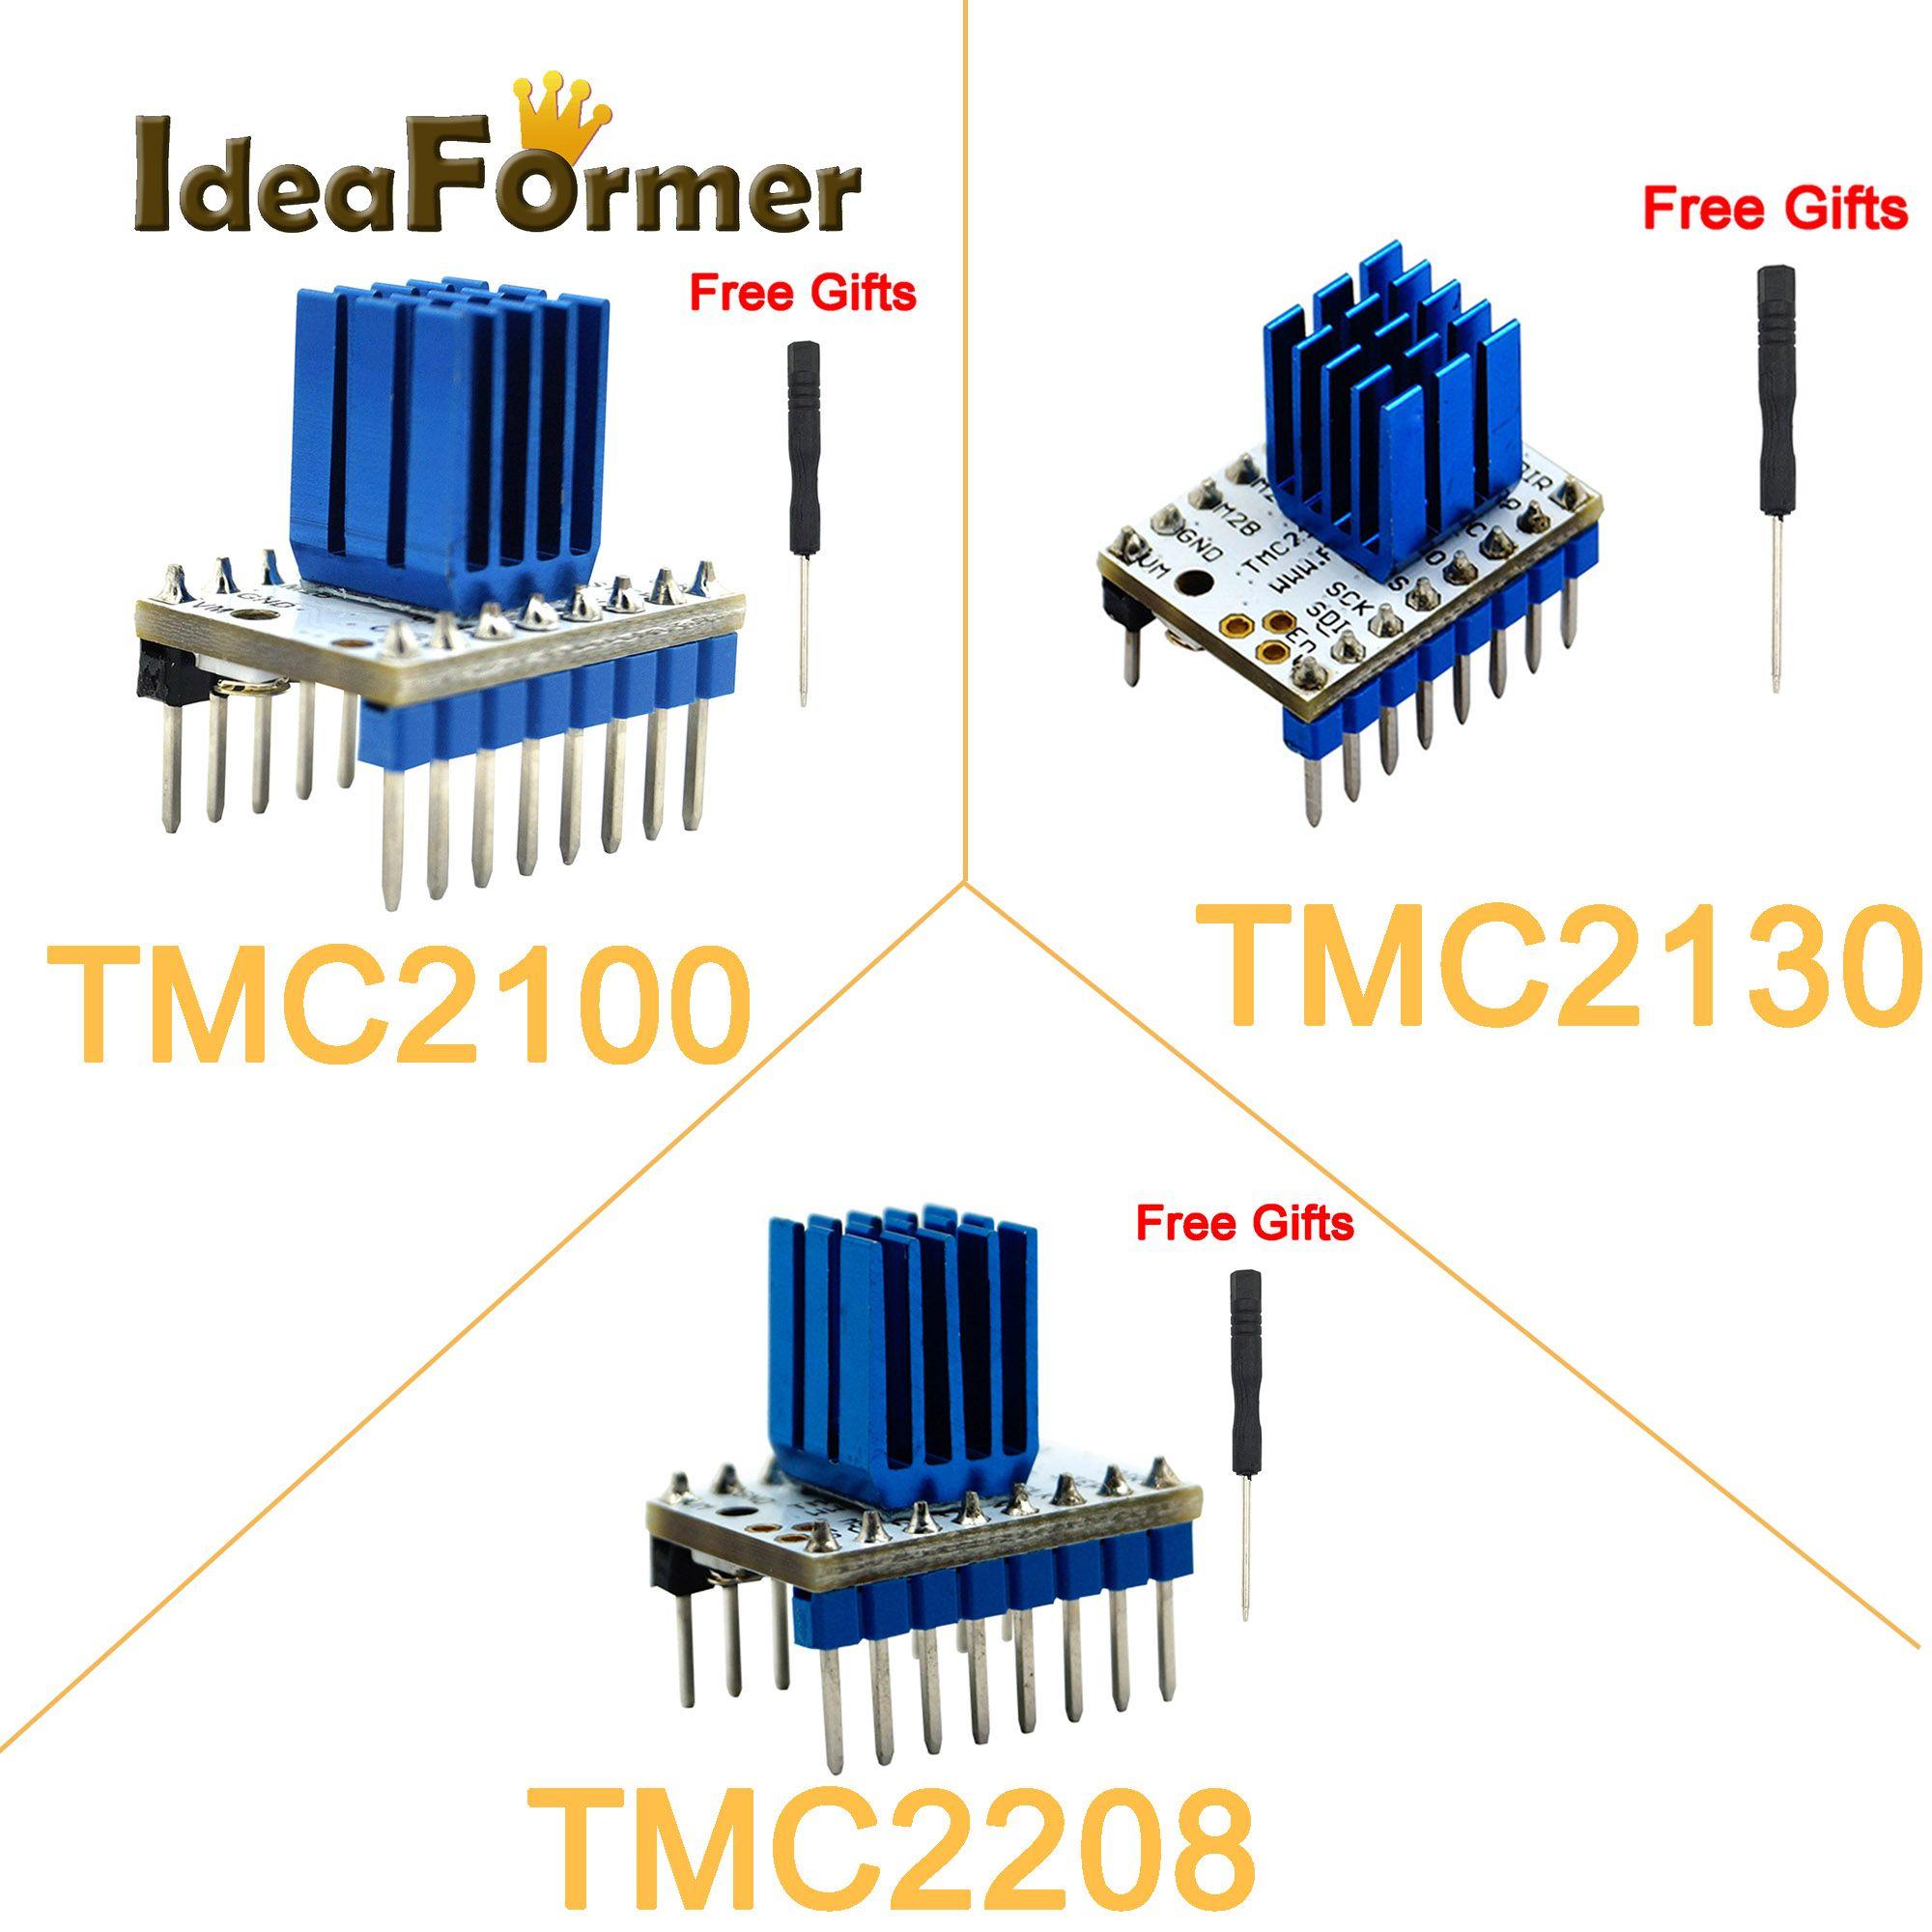 TMC2130 TMC2208 V1.0 TMC2100 V1.3 Stepper Motor StepStick Mute Driver silent excellent stability and protection for 3D Printer